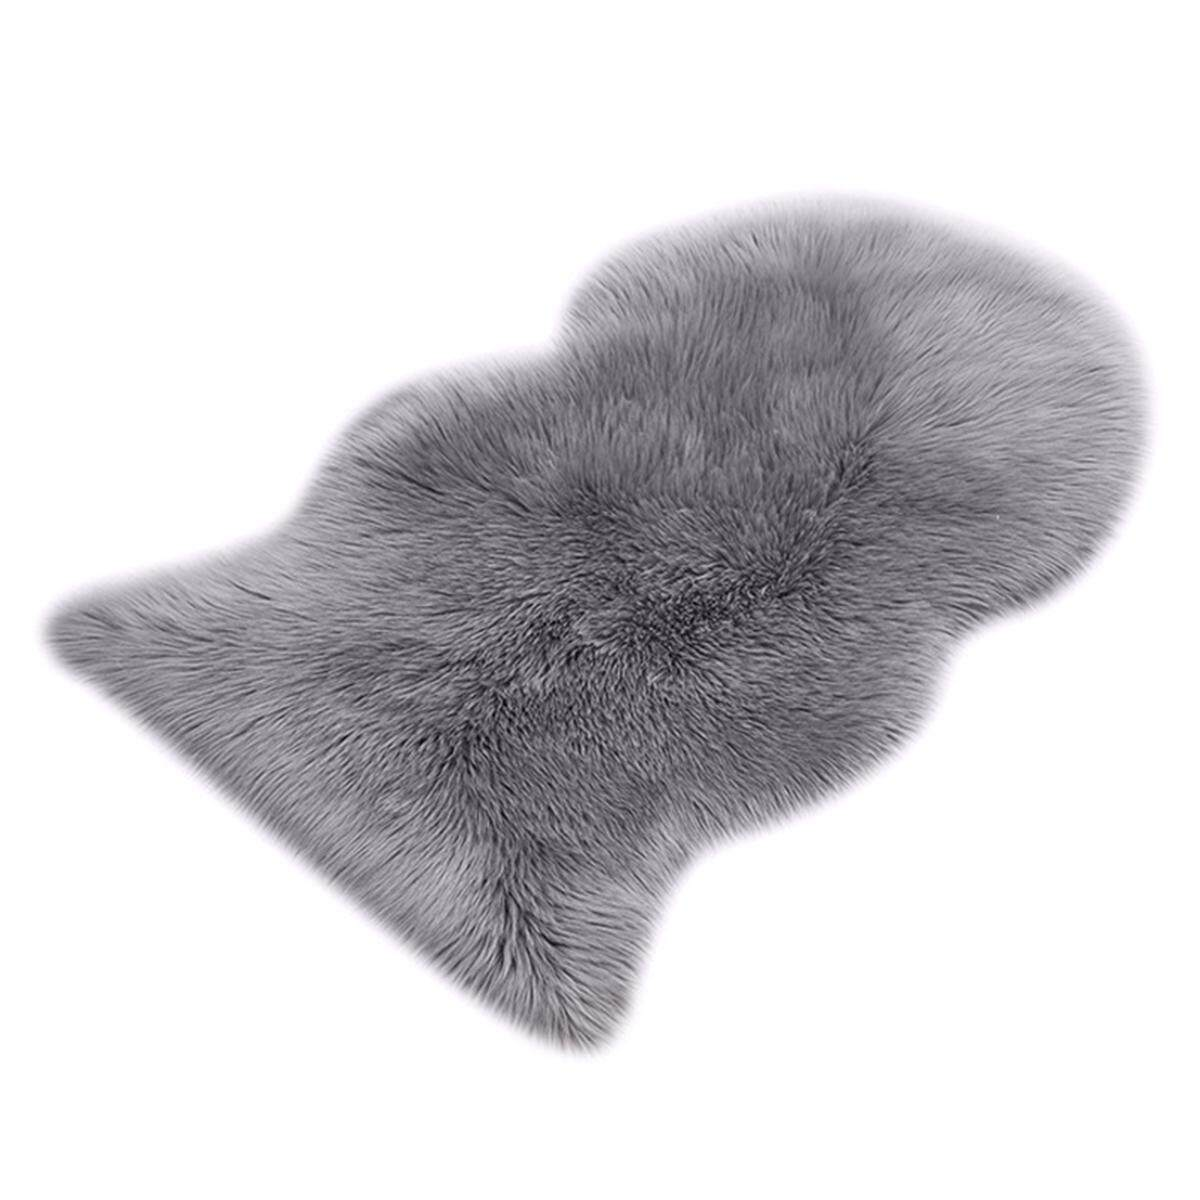 Faux Fur Sheepskin Rug 60 x 90 cm Faux Fleece Fluffy Area Rugs Anti-Skid Carpet for Living Room Bedroom Sofa Nursery Rugs (Grey)